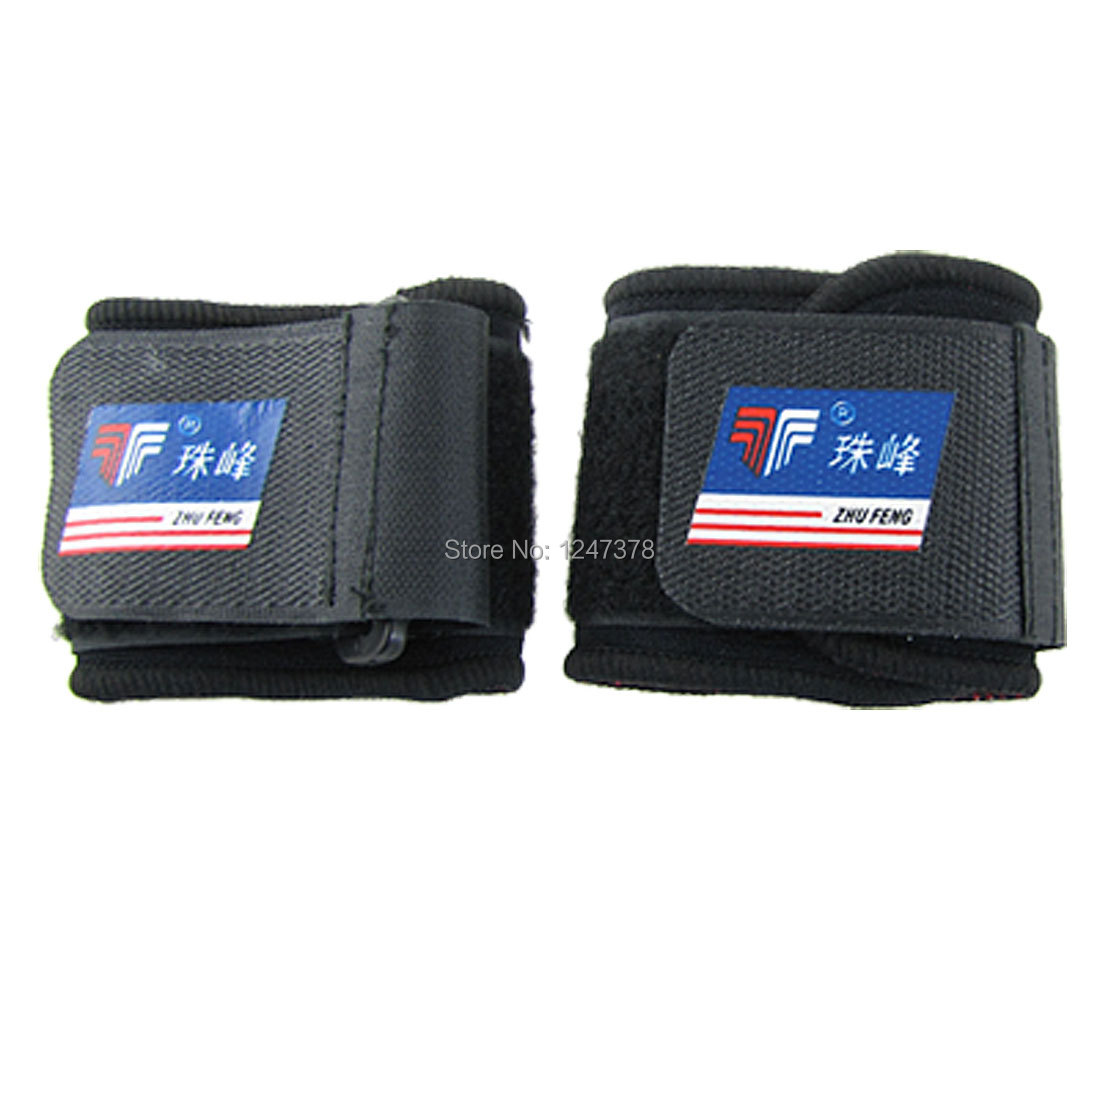 2 Pcs/lot Black Neoprene Wrist Brace Sleeve Support Protector(China (Mainland))